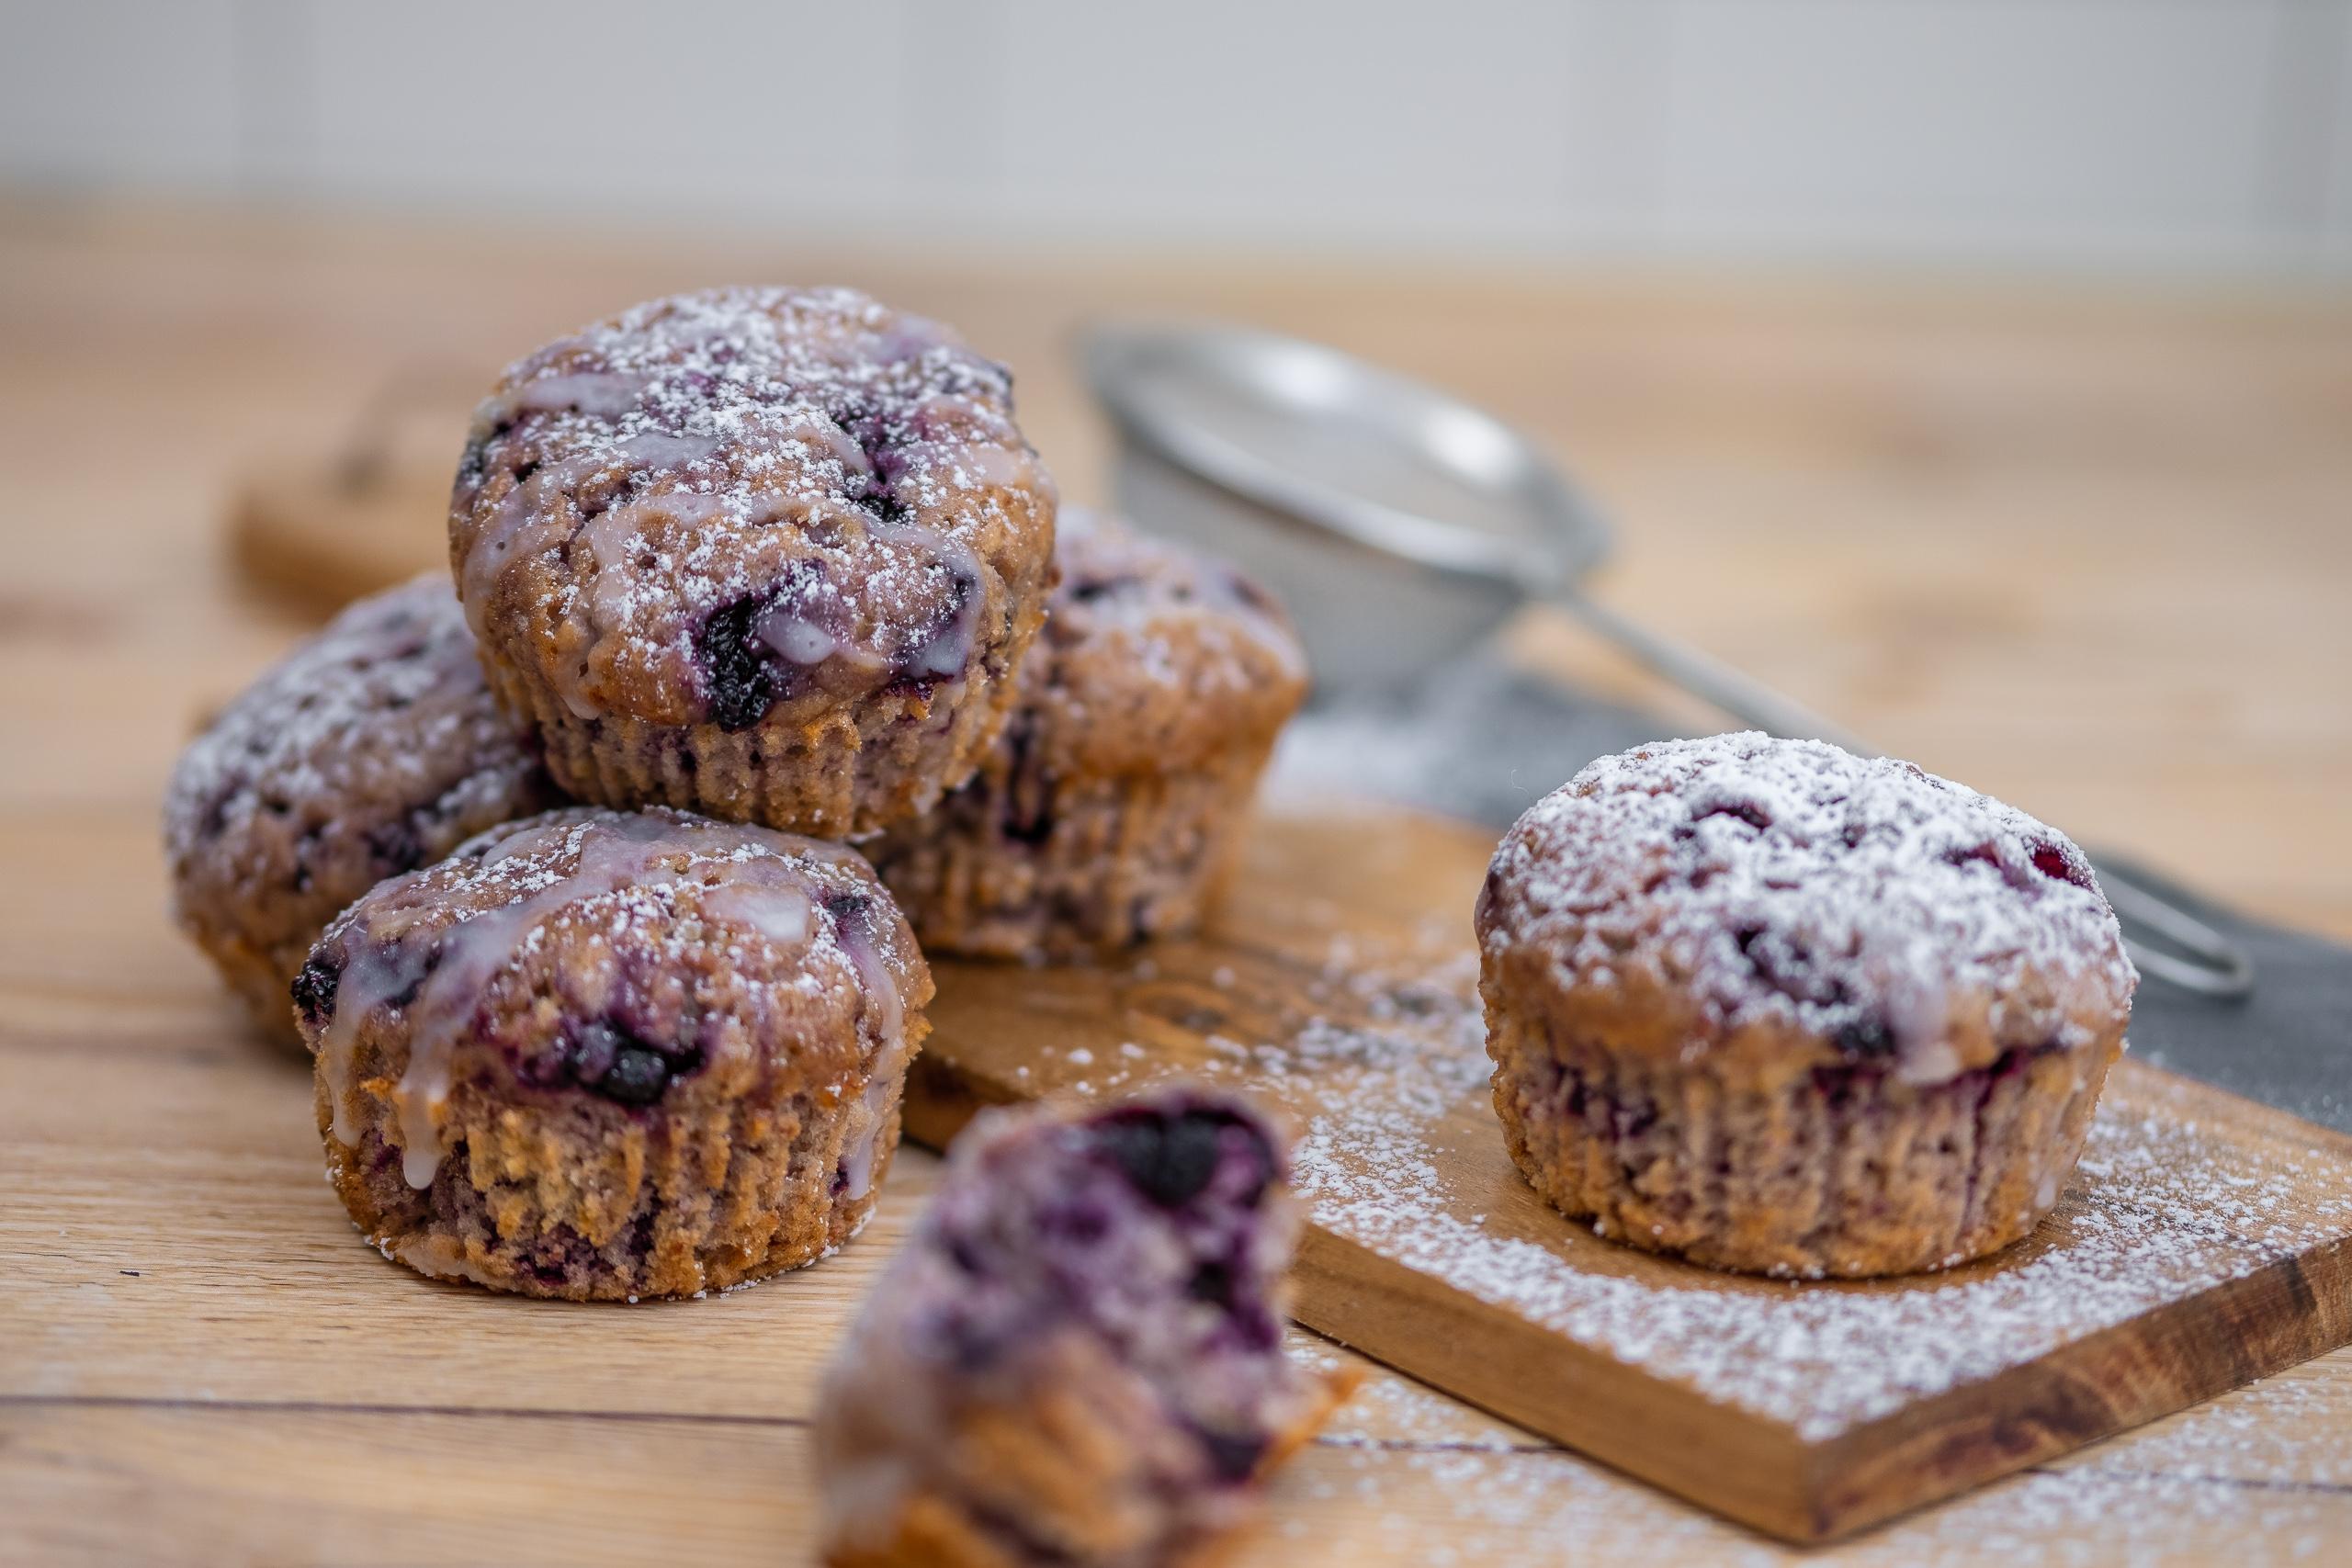 Vegan buleberry muffin